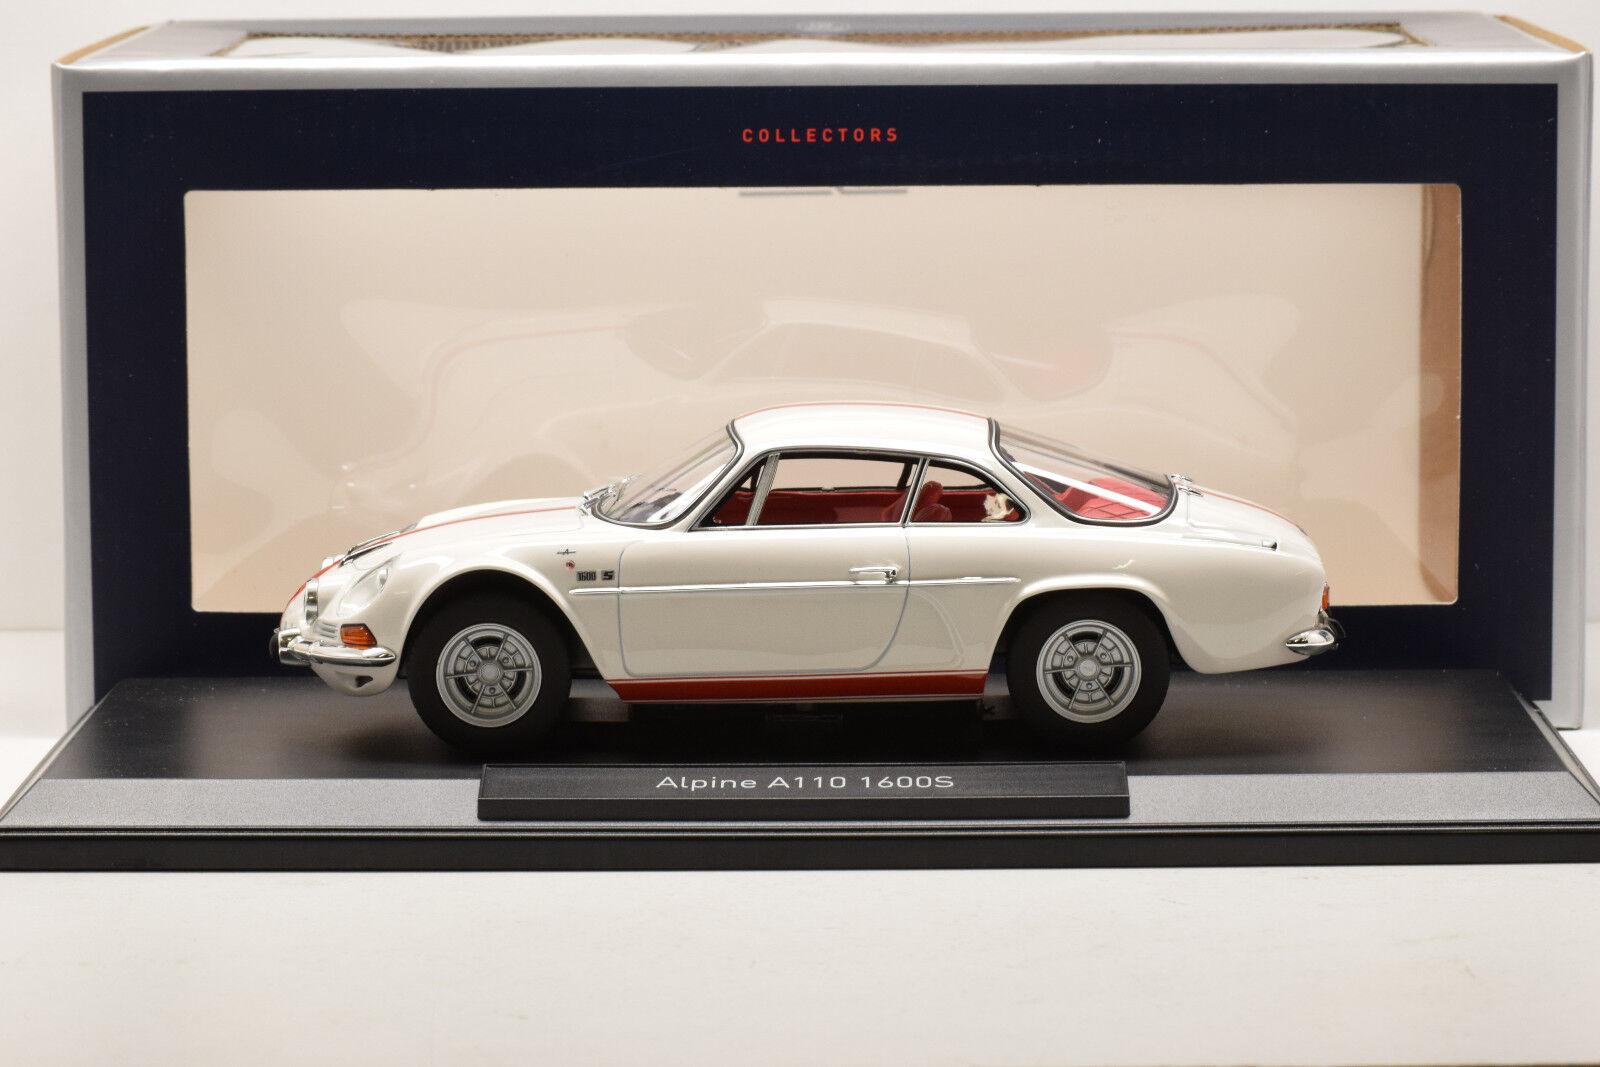 ALPINE RENAULT A110 1600S 1971 bianca & rosso STRIPPING NOREV 1 18 NEUVE EN BOITE